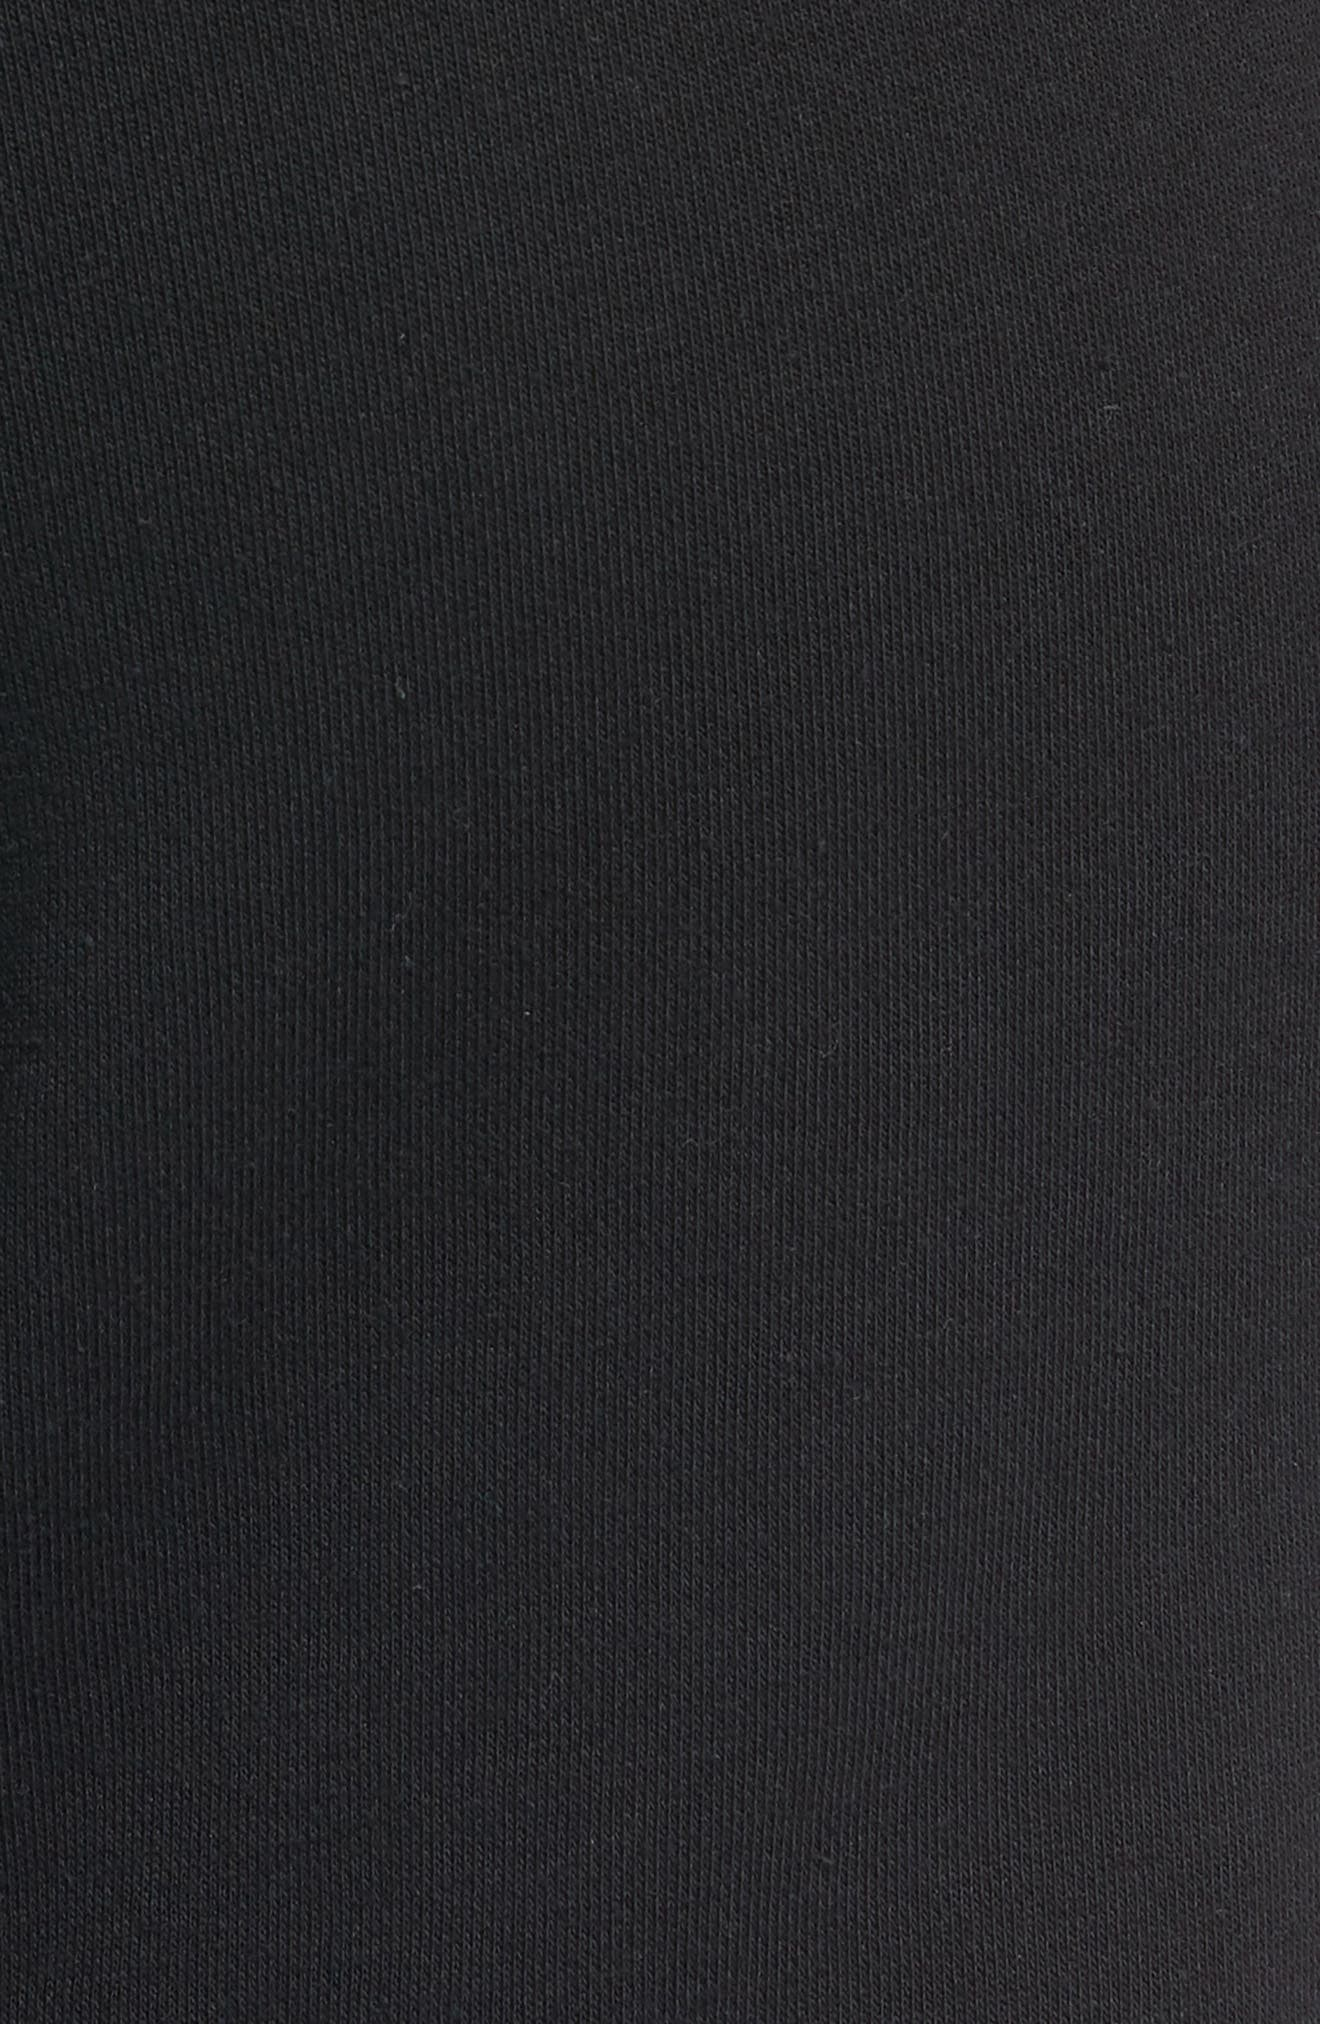 Sportswear Air Force 1 Jogger Pants,                             Alternate thumbnail 5, color,                             BLACK/ ANTHRACITE